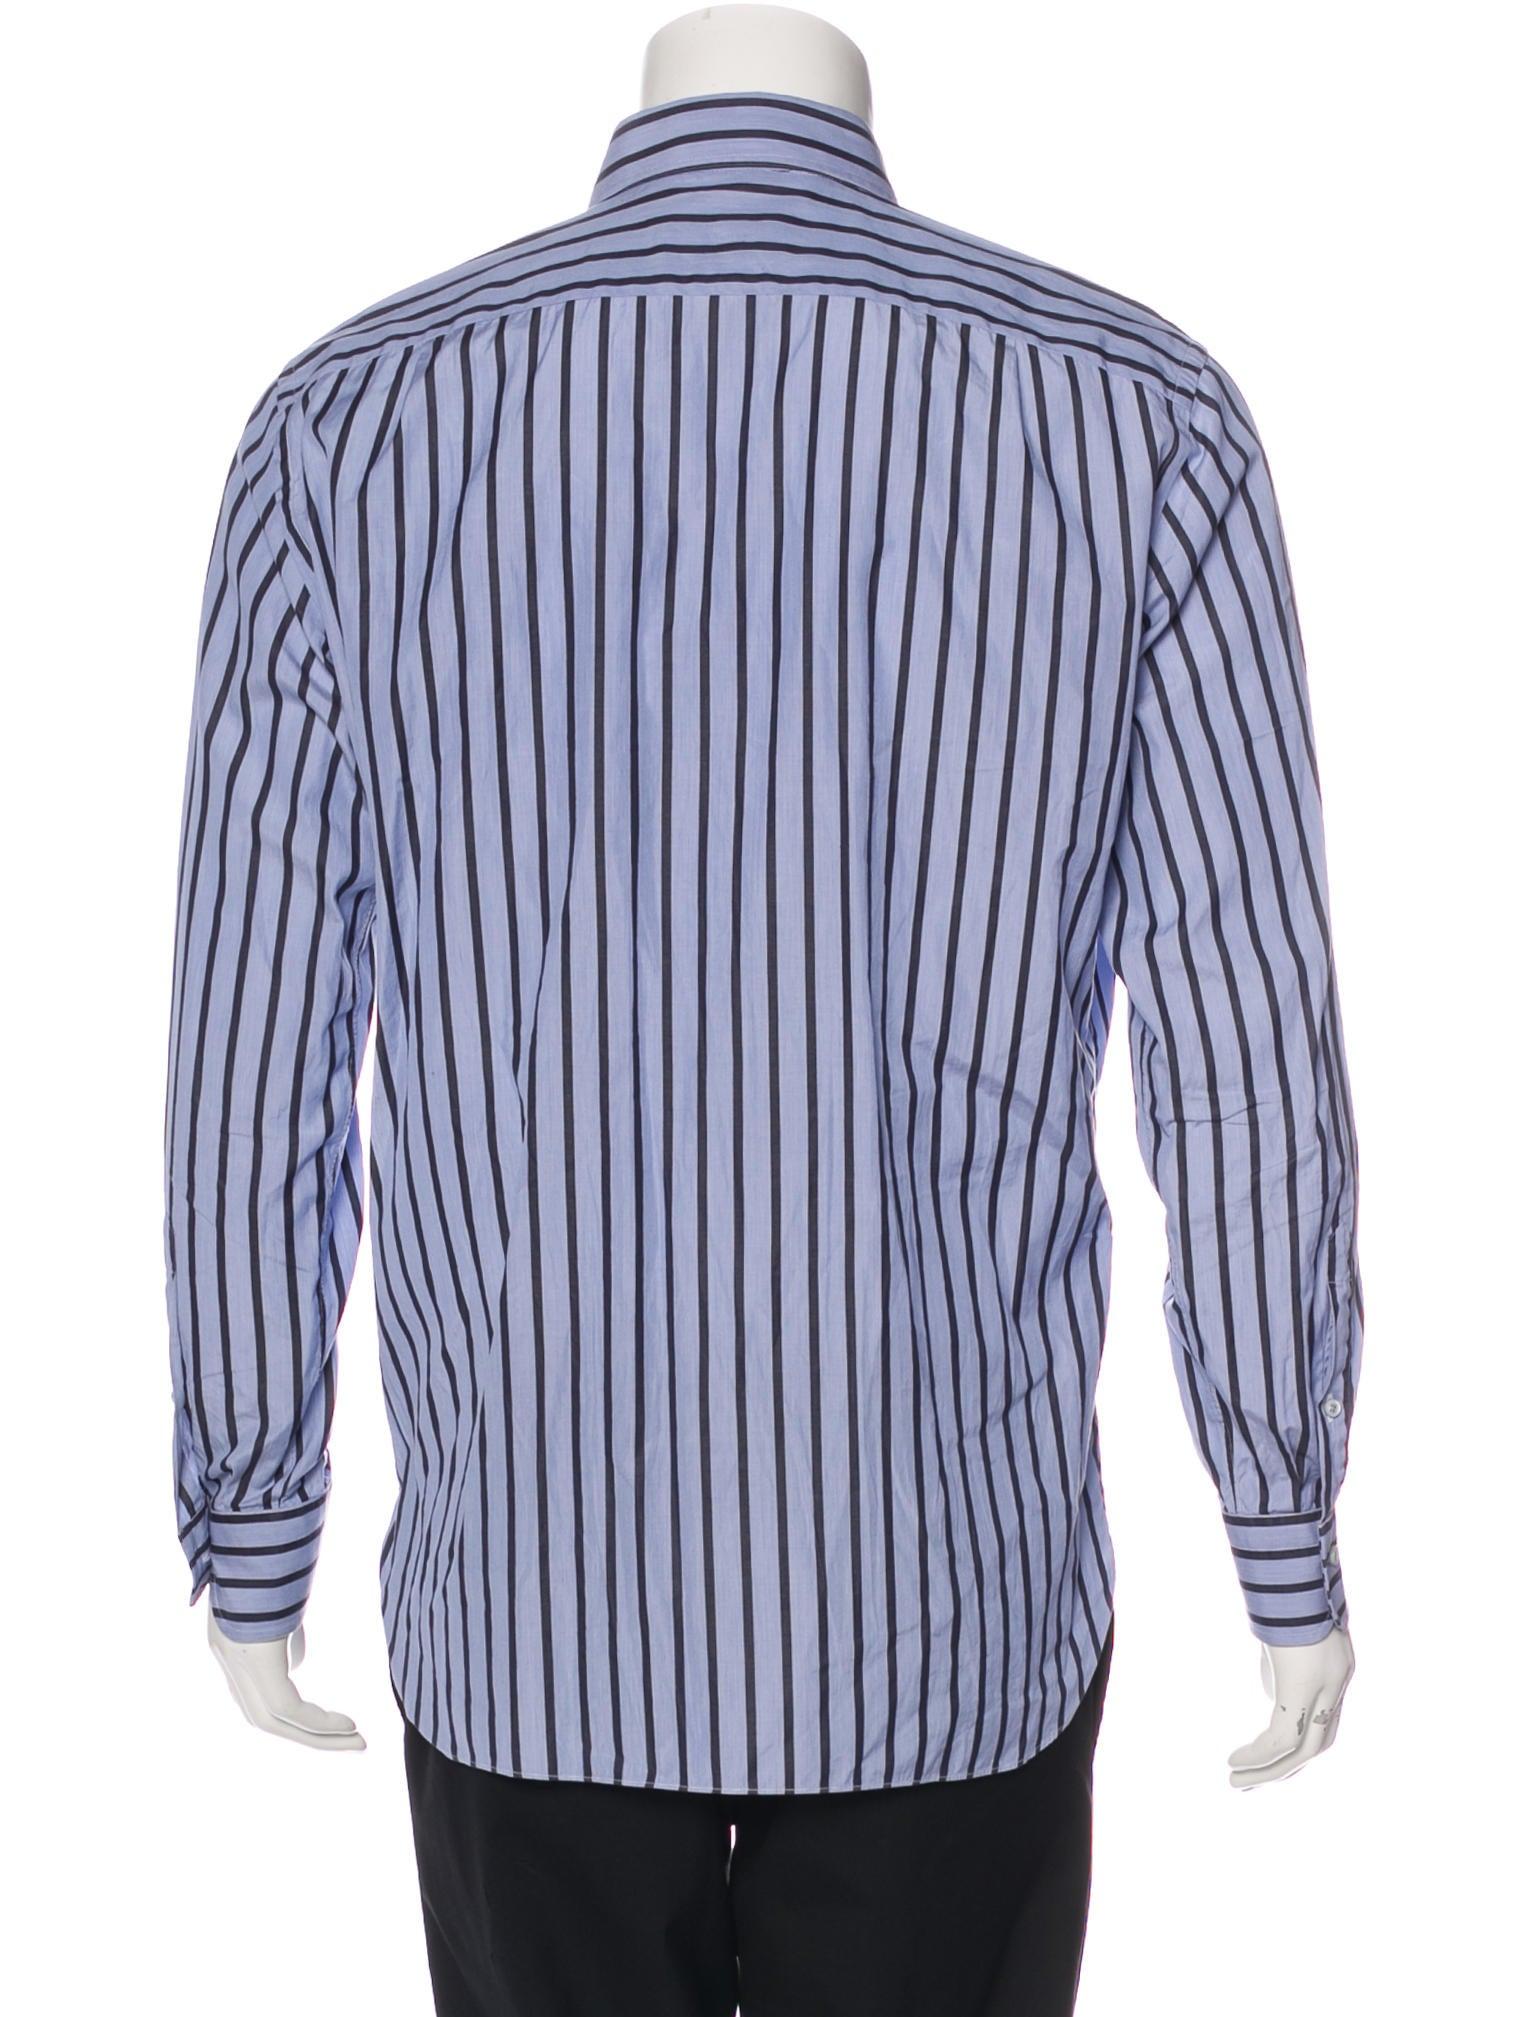 Ermenegildo zegna regular fit striped shirt clothing for Regular fit dress shirt